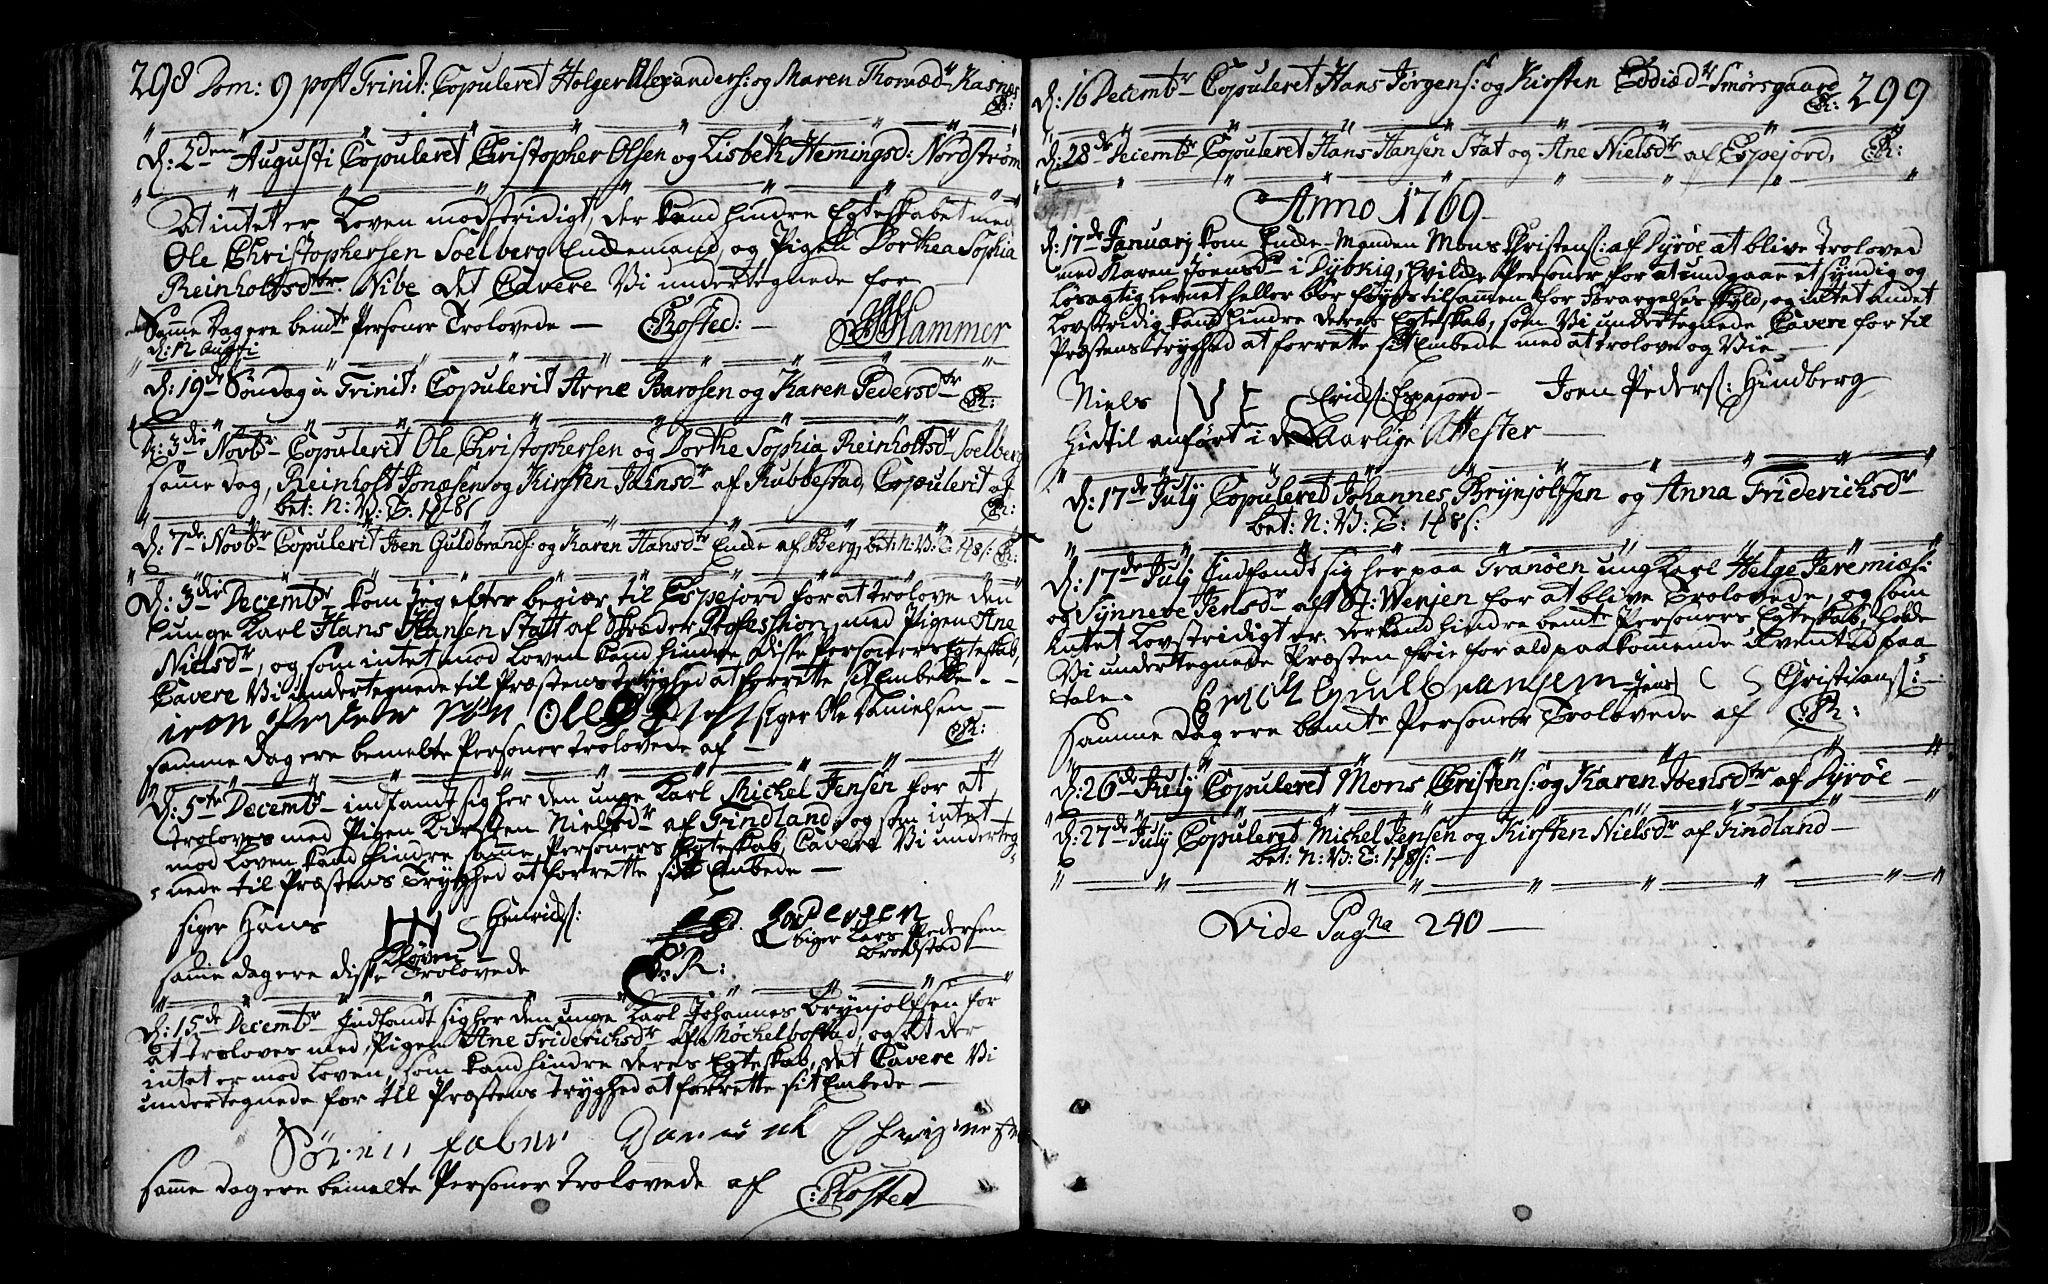 SATØ, Tranøy sokneprestkontor, I/Ia/Iaa/L0001kirke: Ministerialbok nr. 1, 1757-1773, s. 298-299